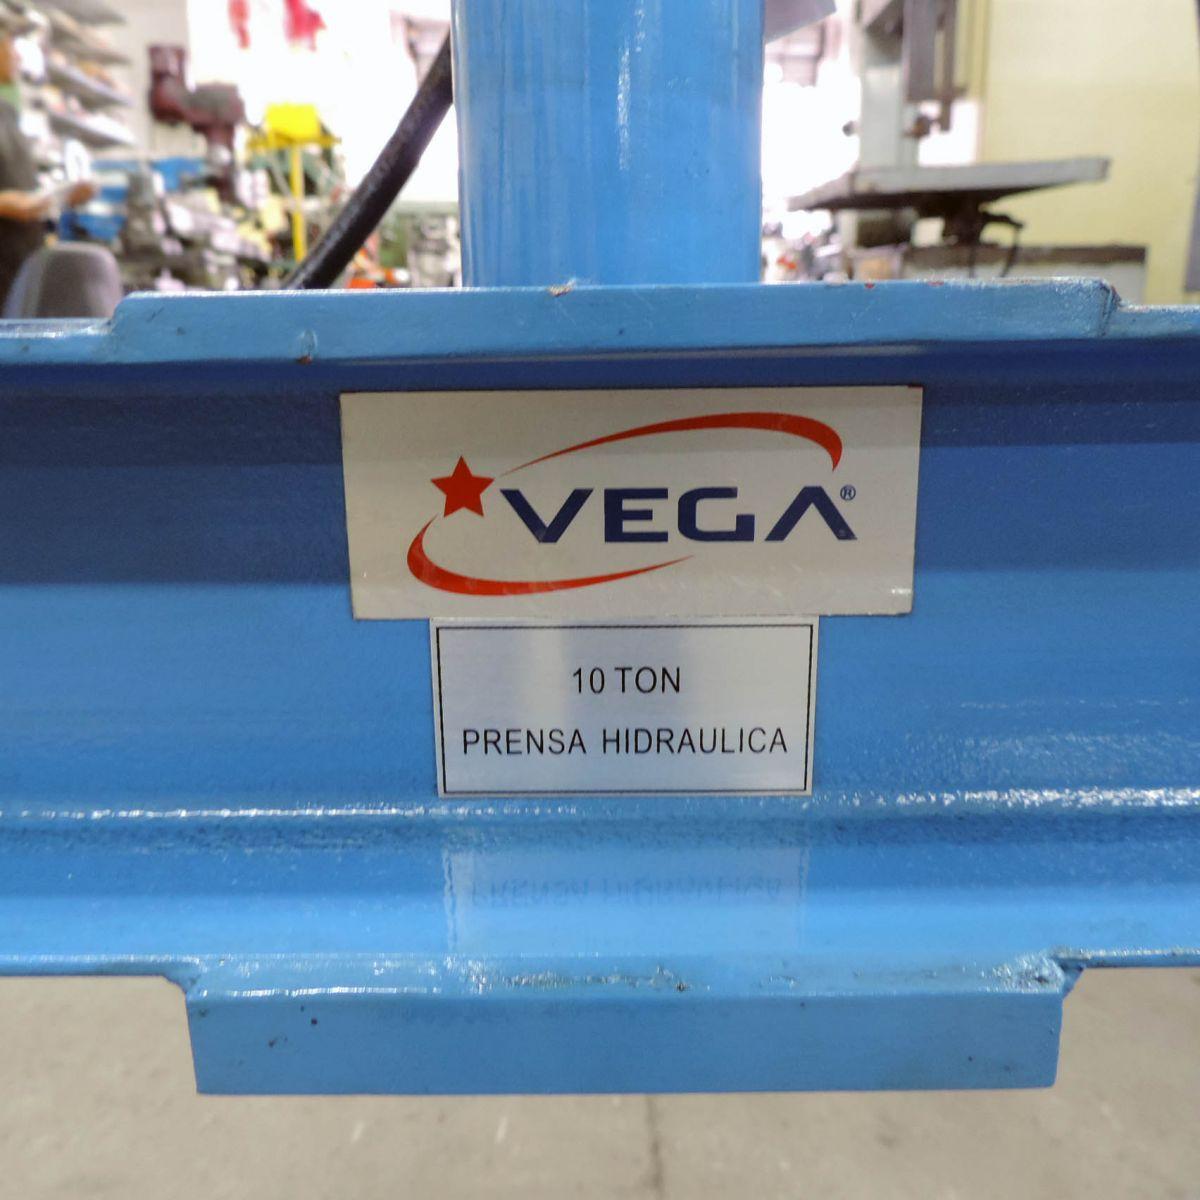 32 Prensa Hidráulica 10 Toneladas Vega Ph2